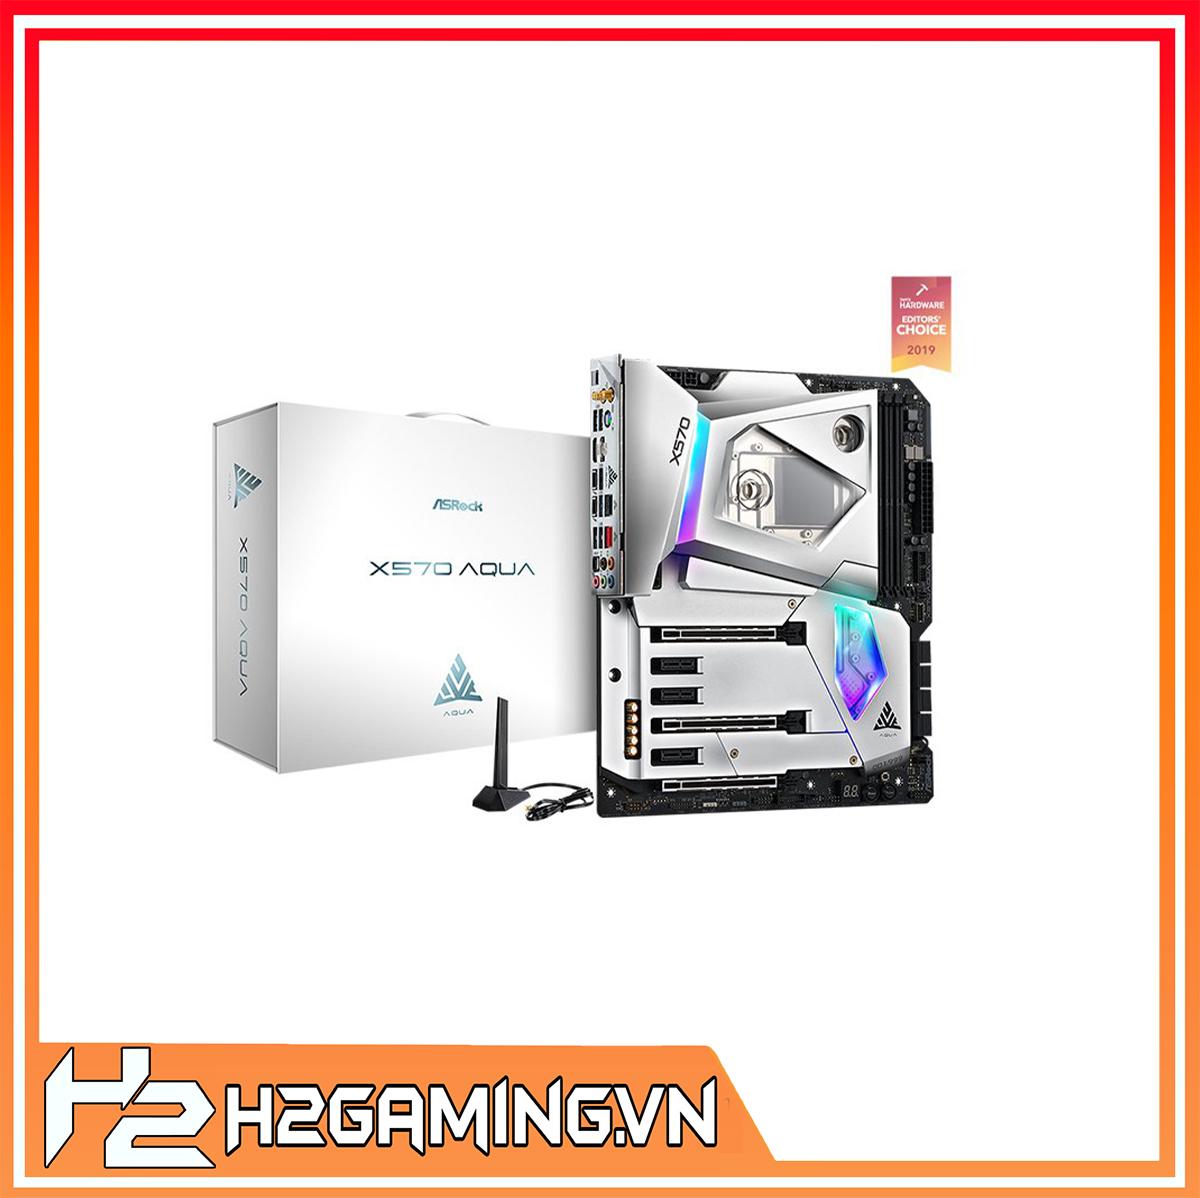 Mainboard_ASROCK_Z490_AQUA_(Intel_Z490,_Socket_1200,_E-ATX,_4_khe_Ram_DDR4)